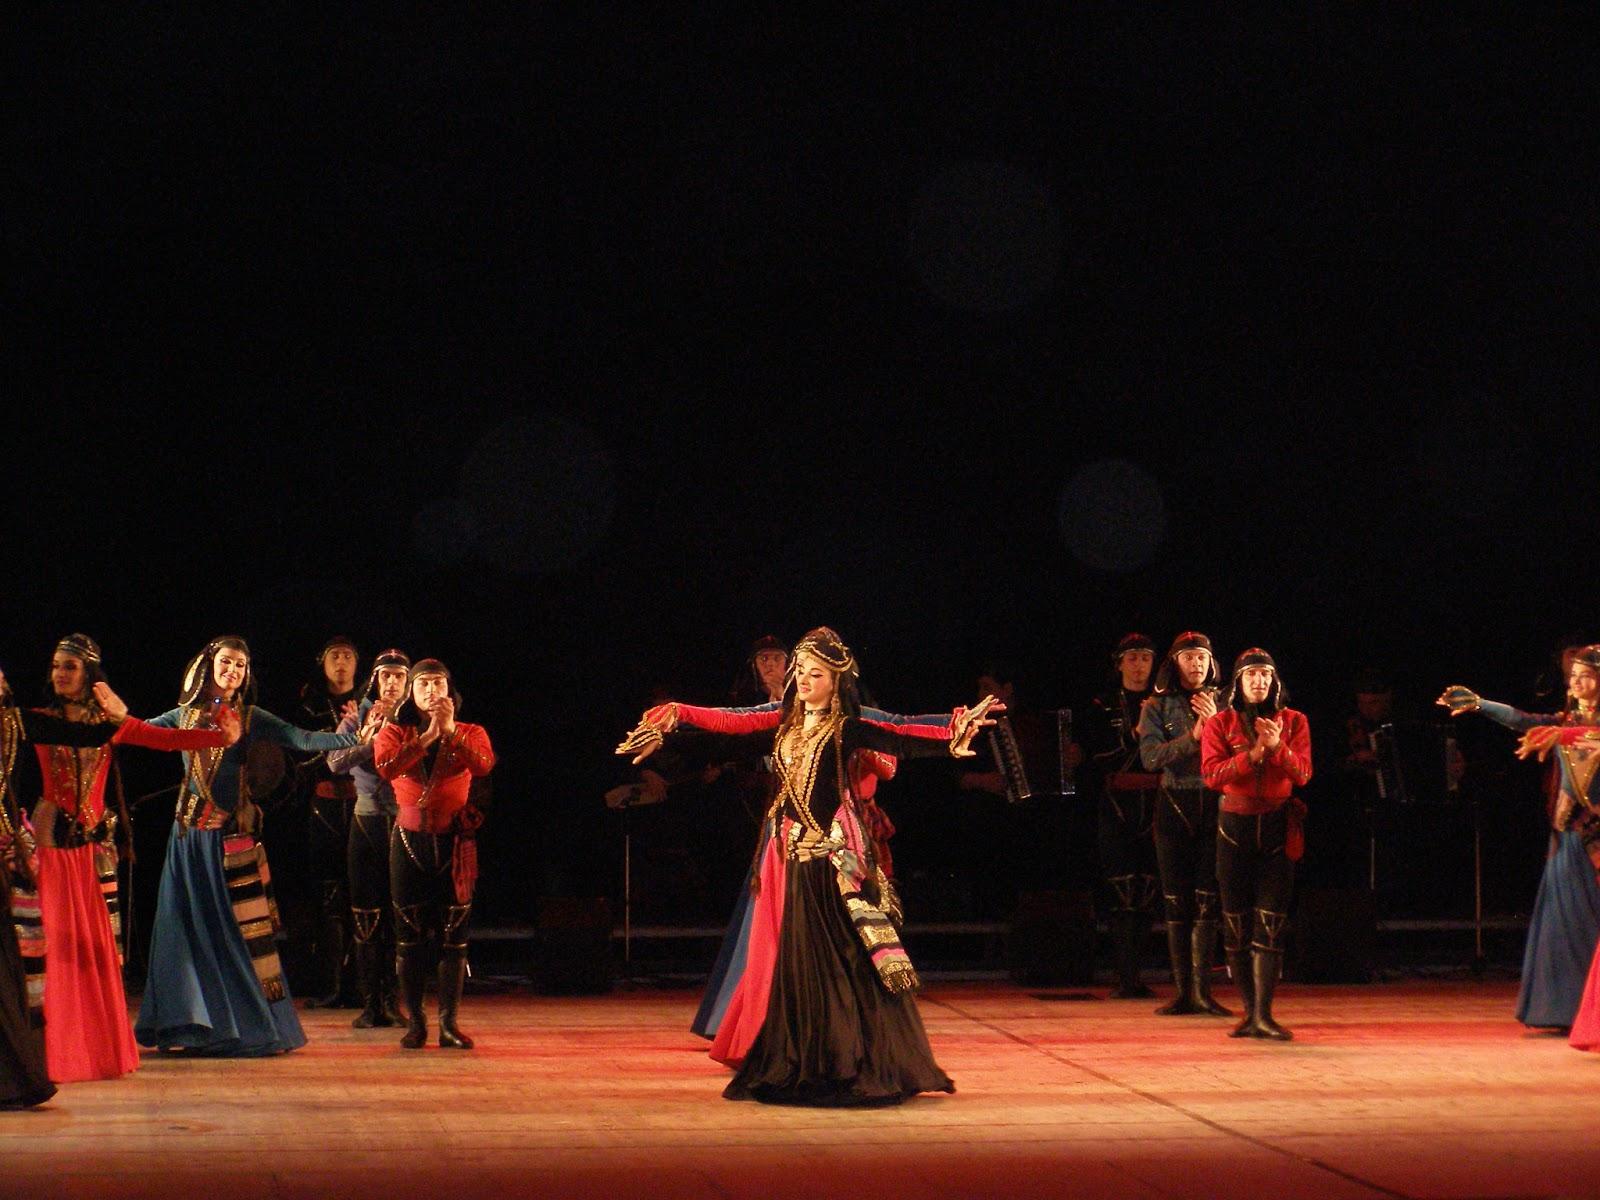 Грузинский танец на конкурс